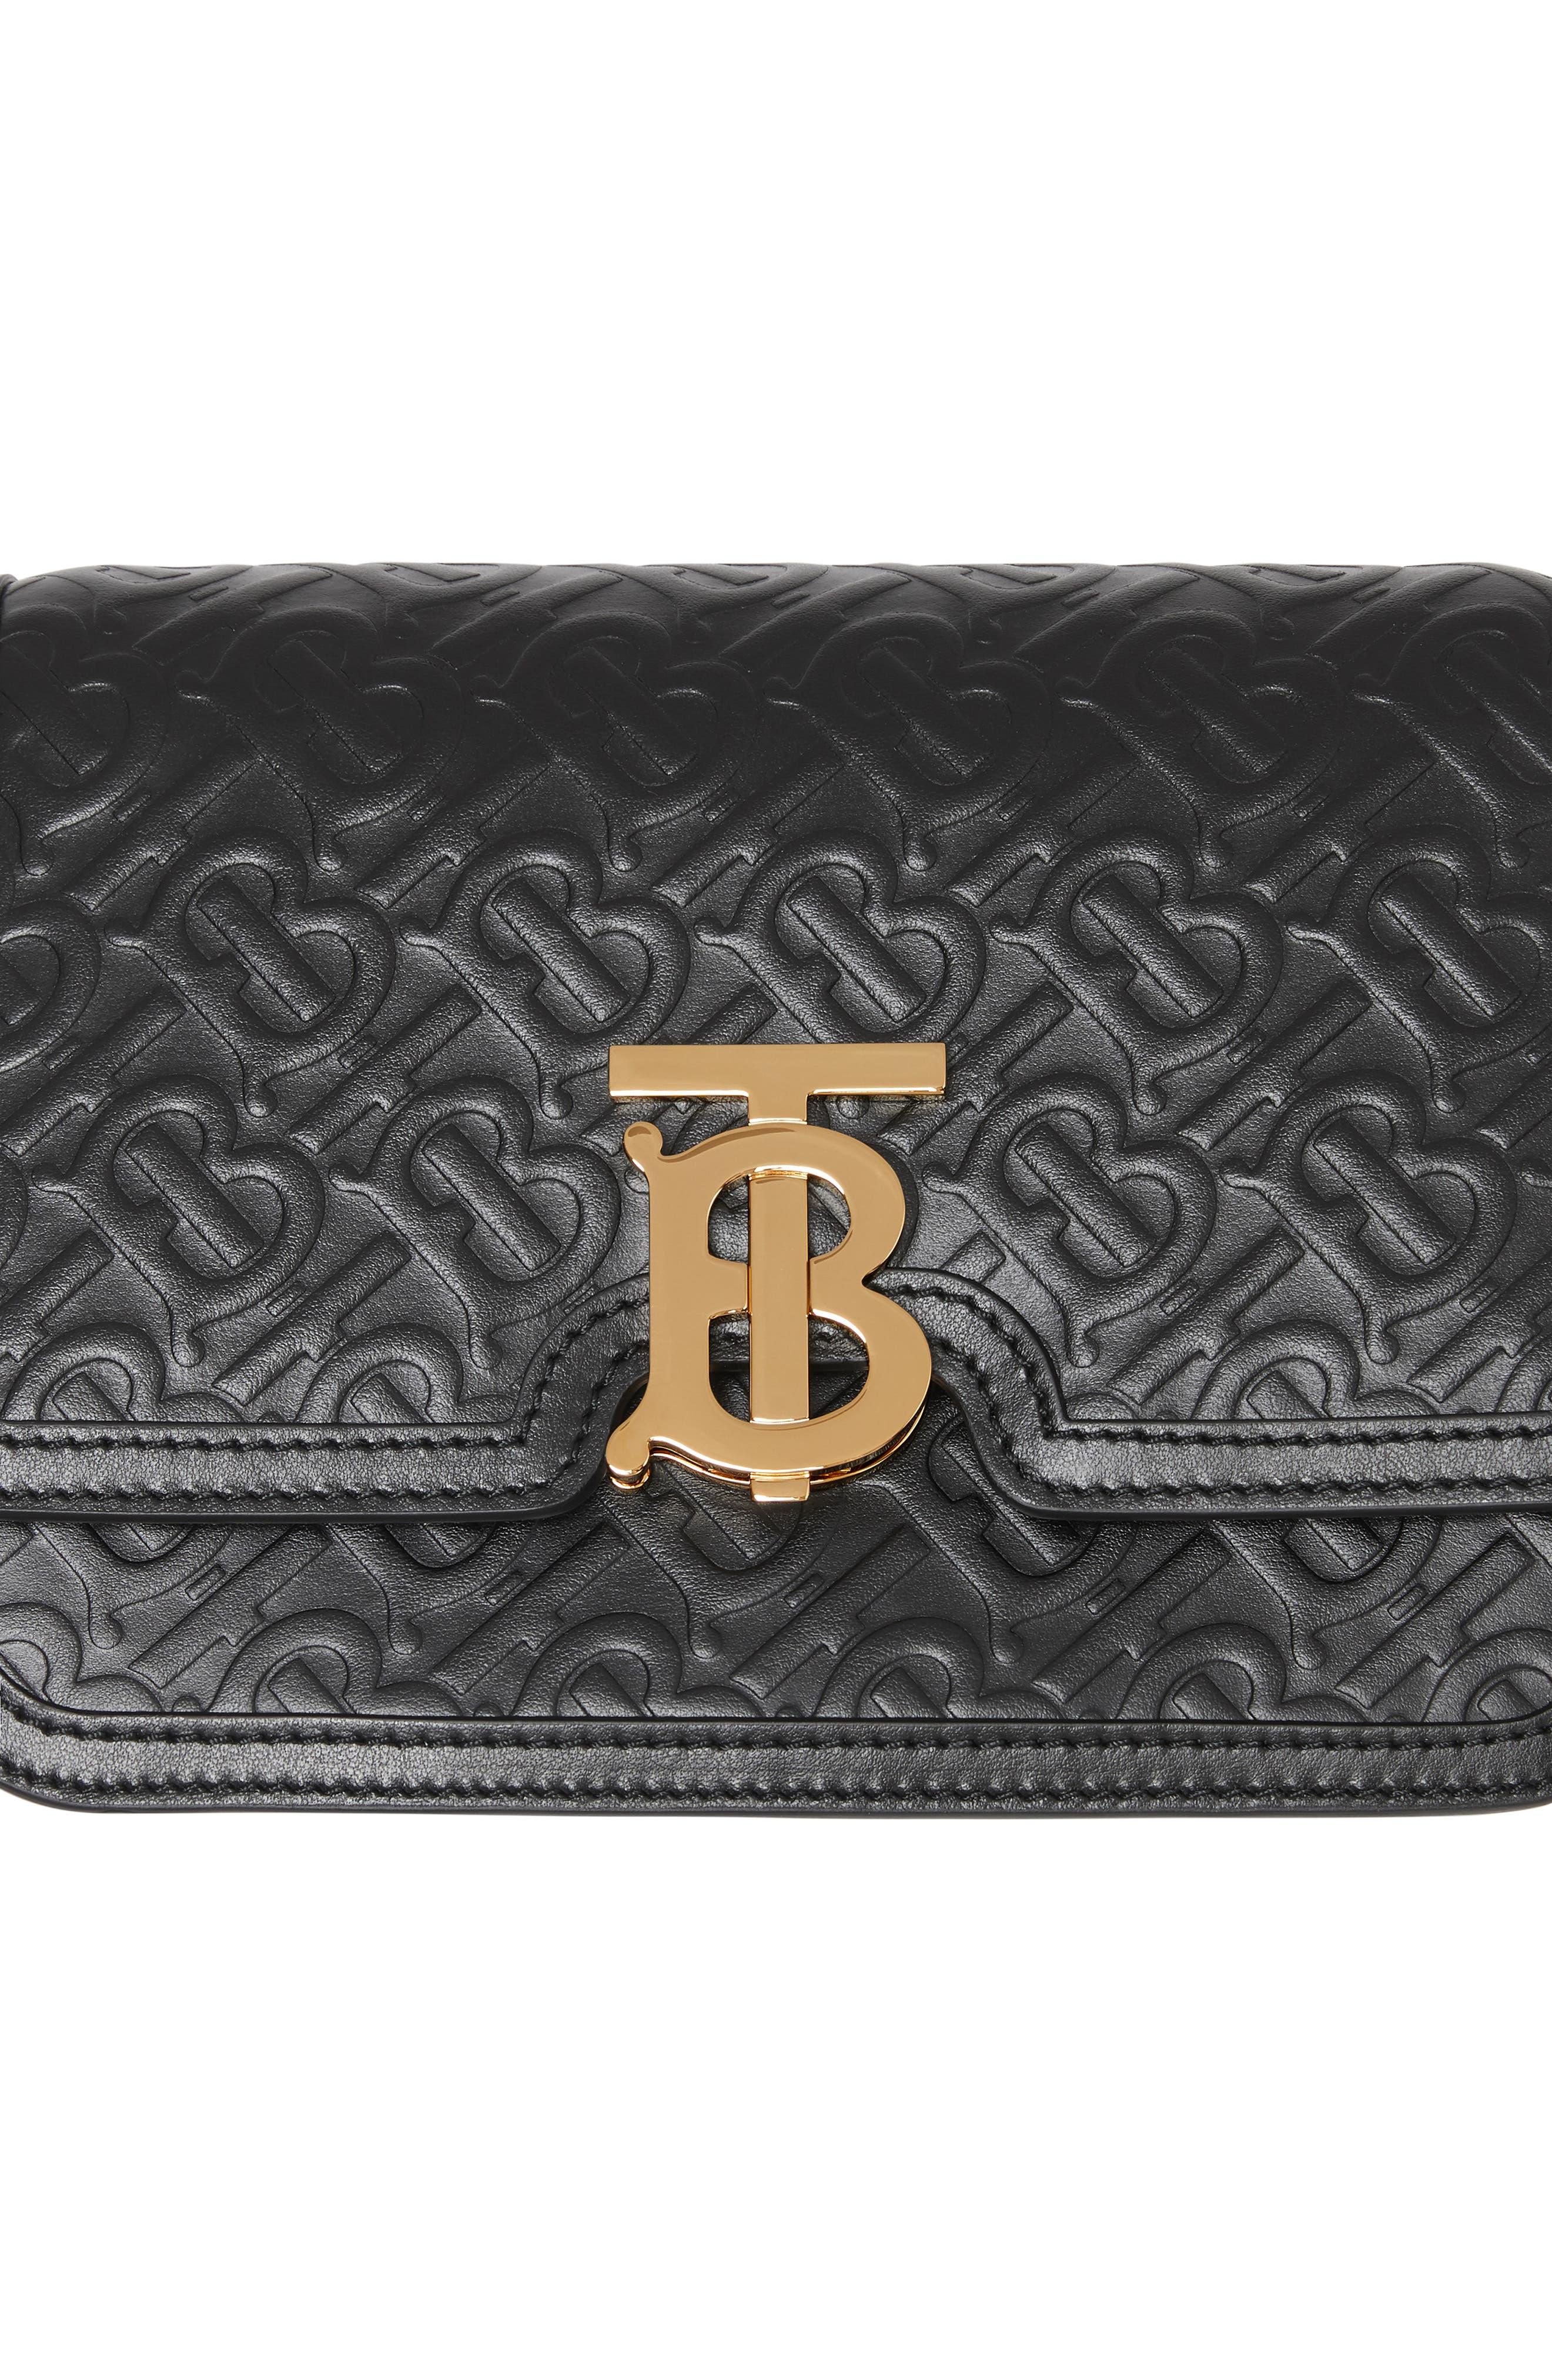 BURBERRY,                             Small Monogram Leather TB Bag,                             Alternate thumbnail 5, color,                             BLACK